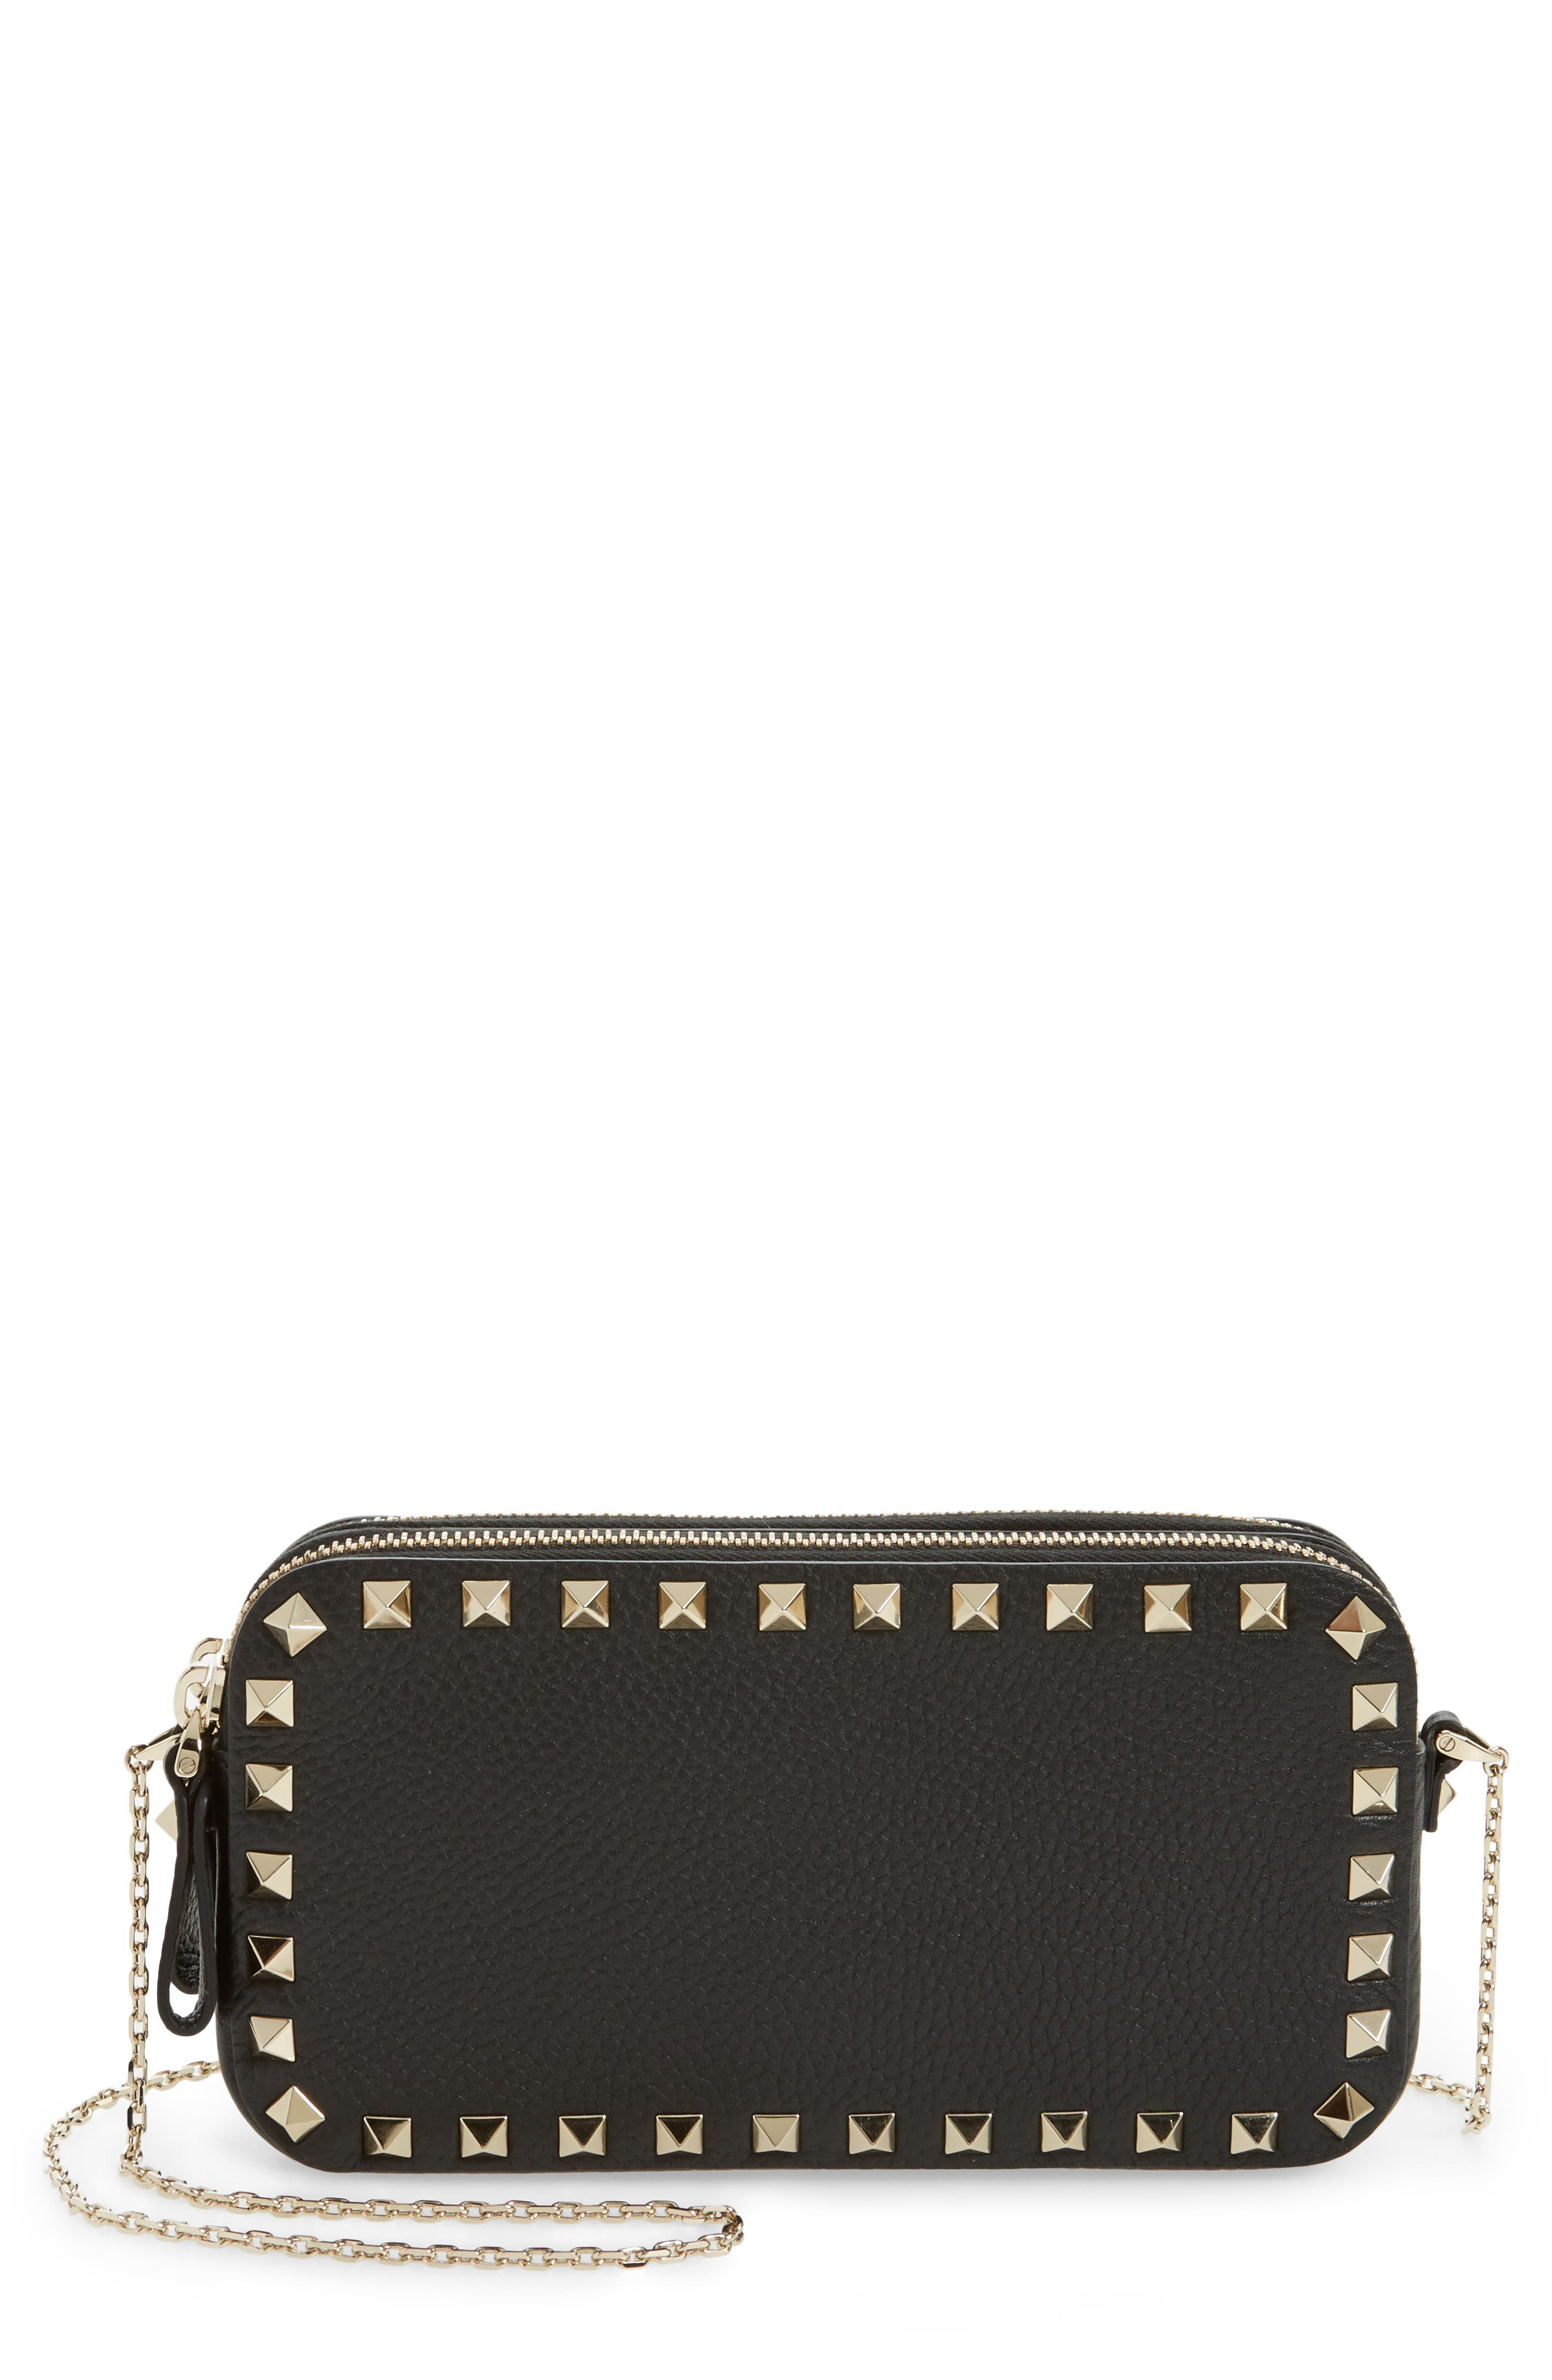 229cc22f6b33 Pouches Handbags   Wallets for Women